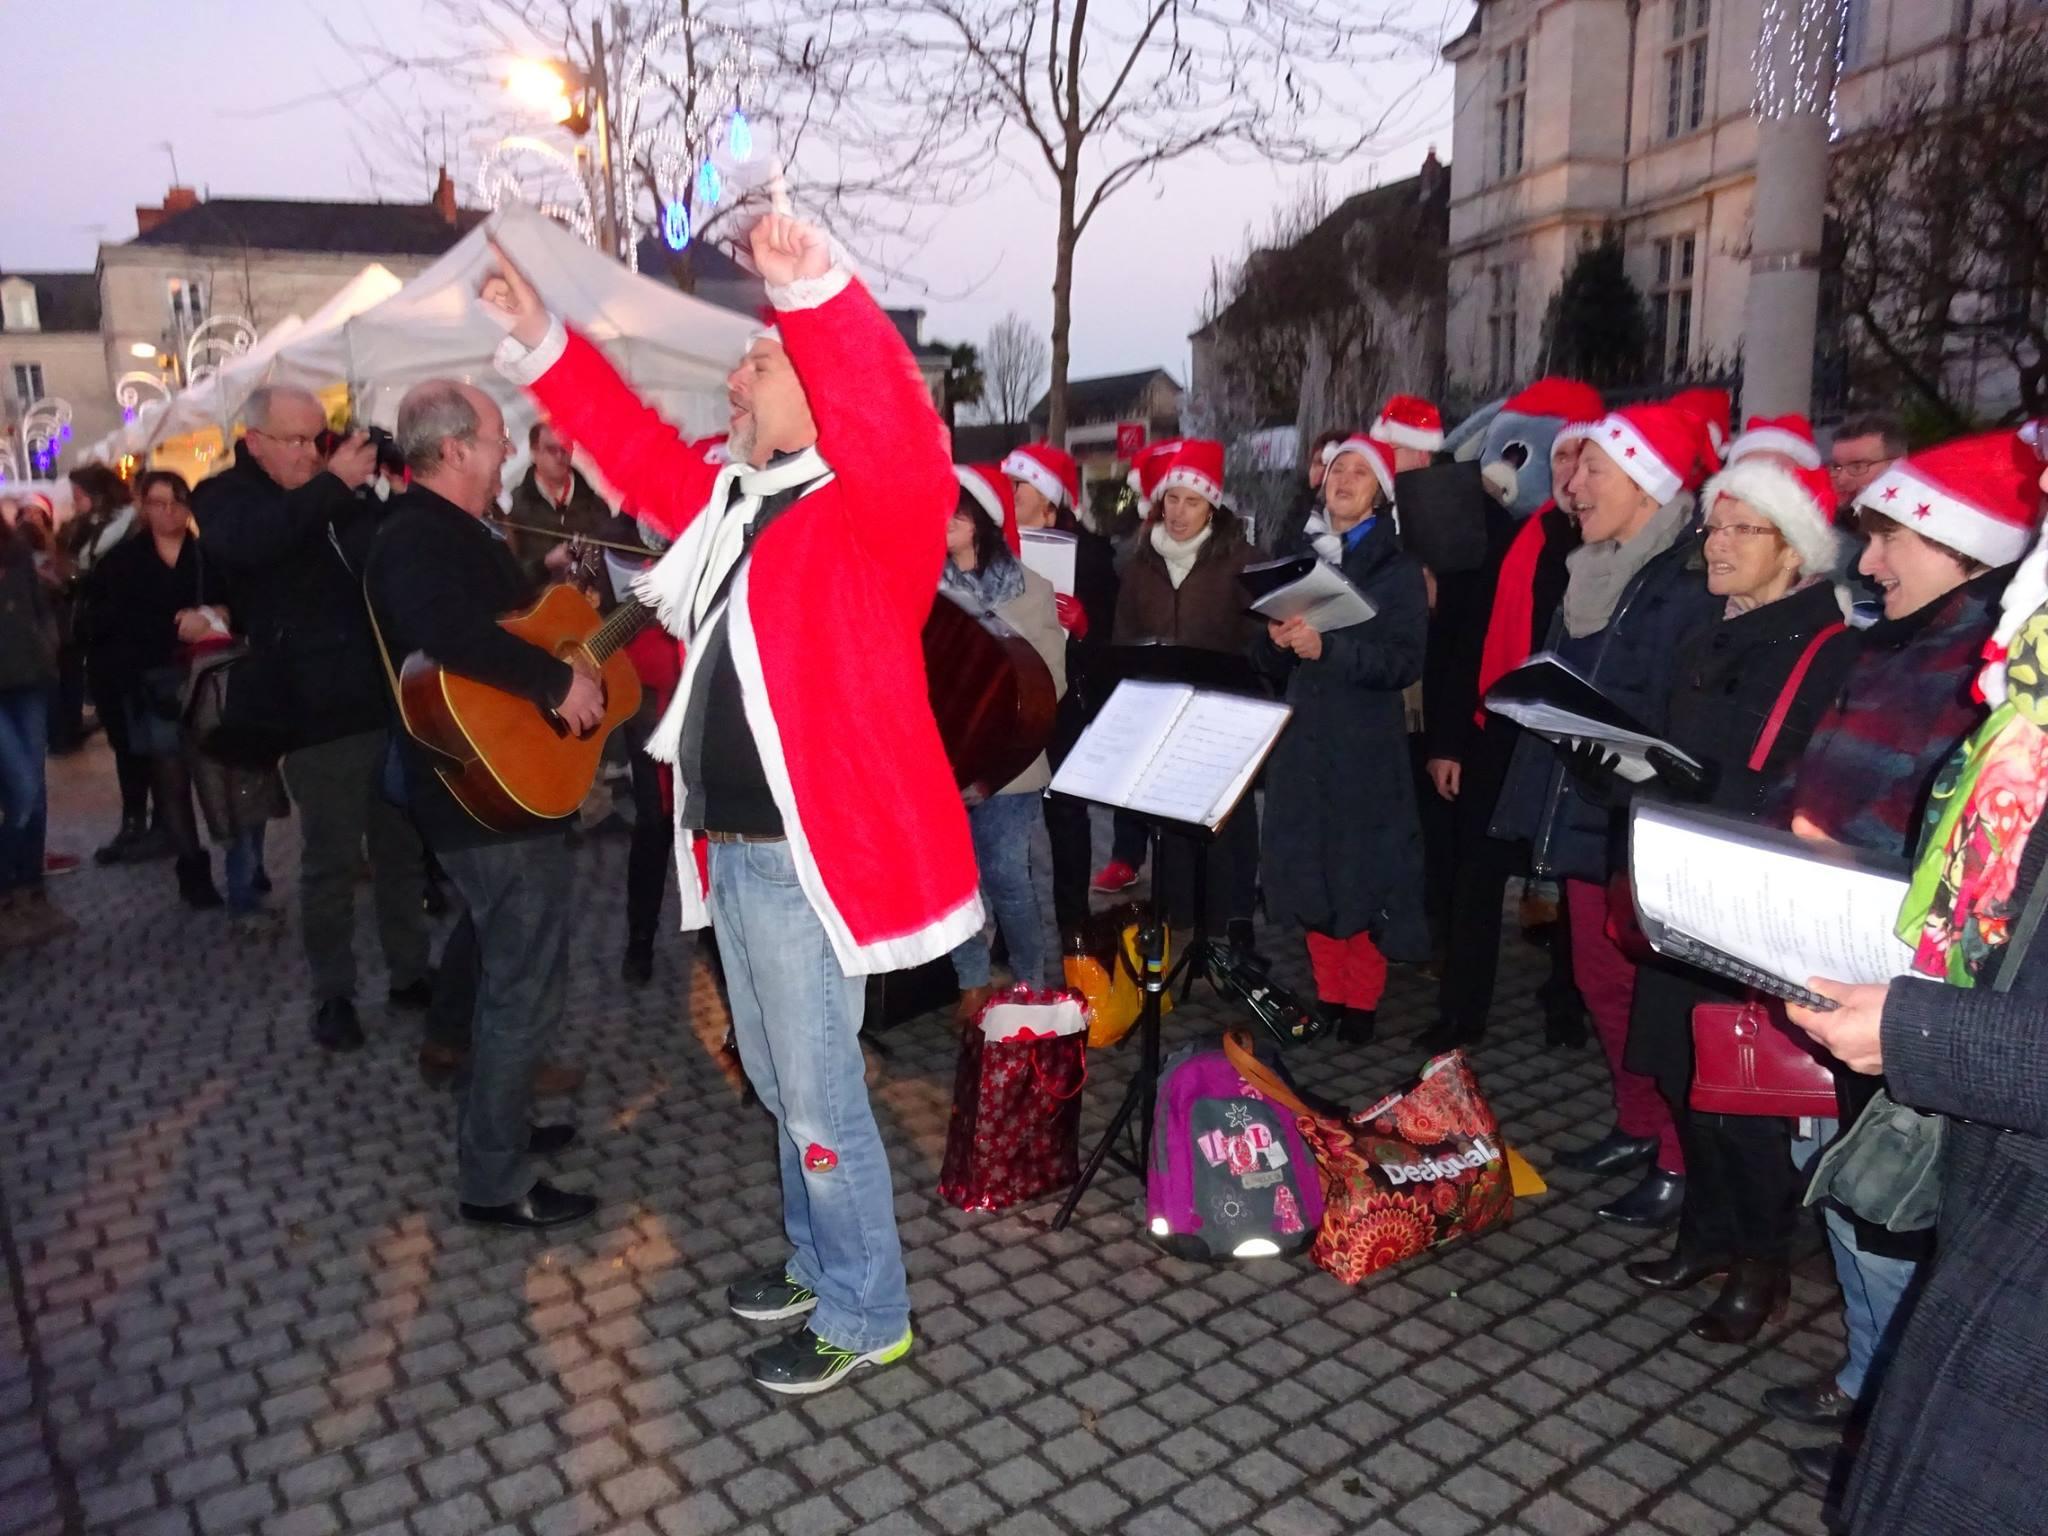 2015-12-12 – Au marché de Noël (11) Sabrina